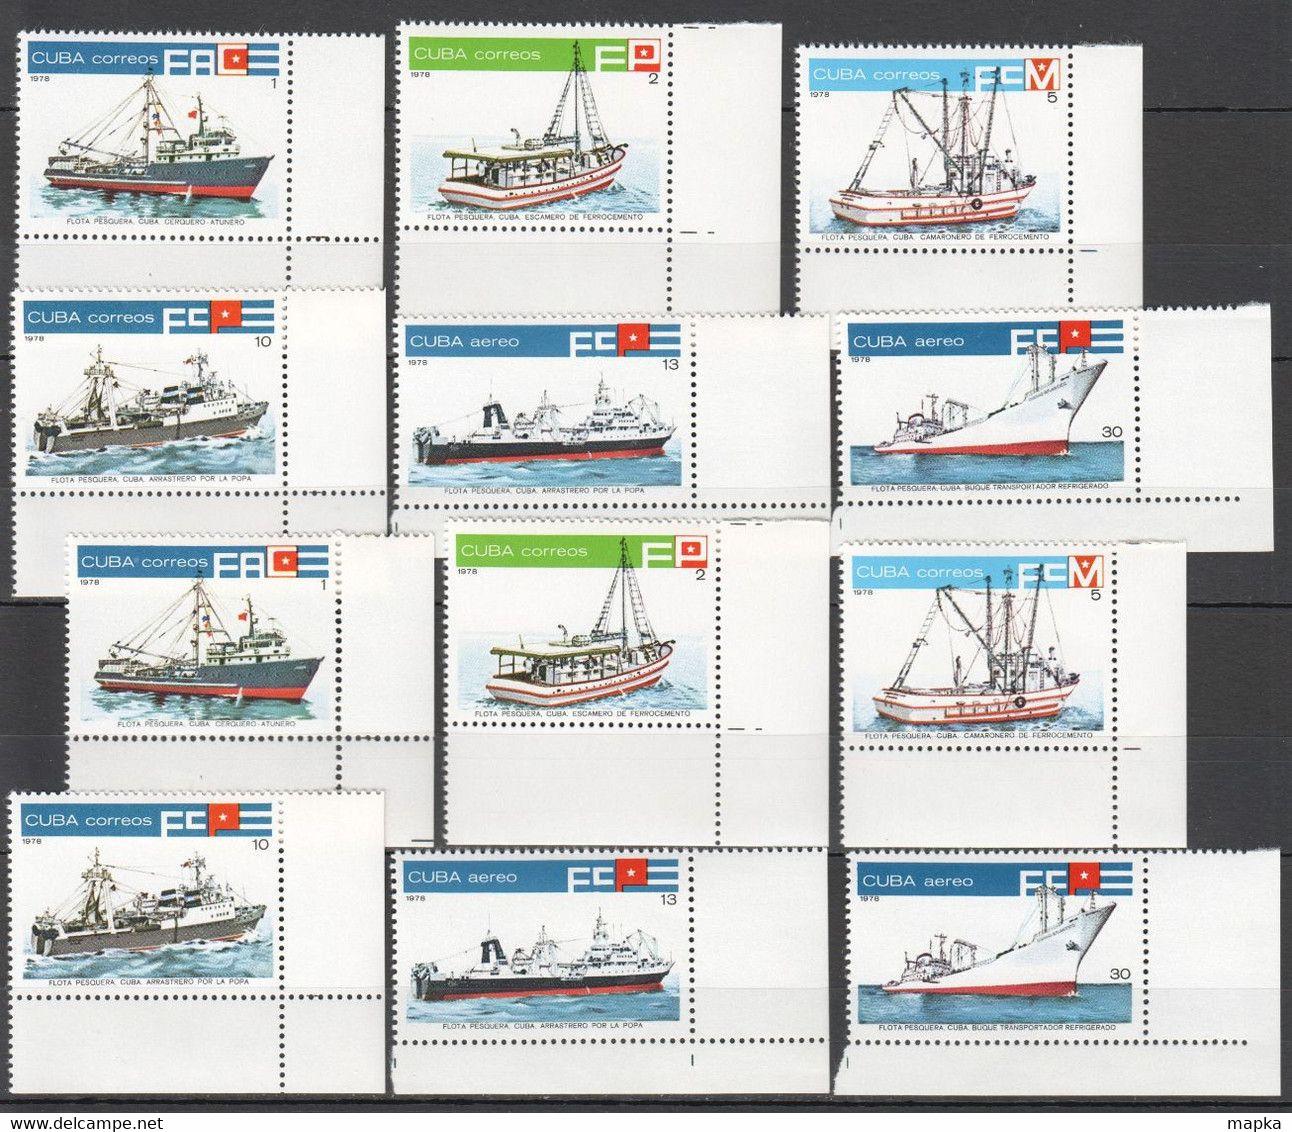 UU884 1978 CUBA TRANSPORT SHIPS 2SET MNH - Ships